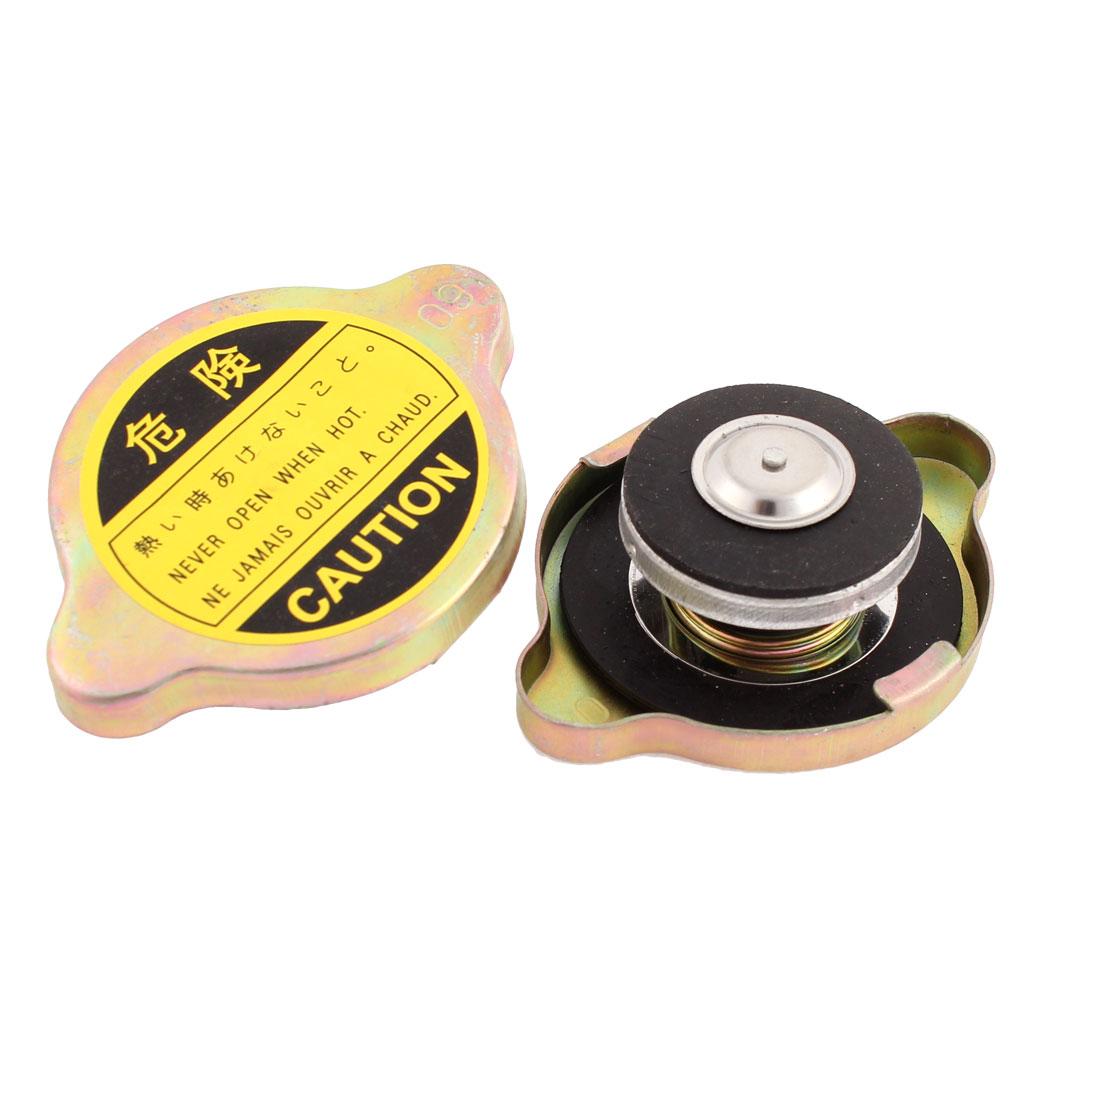 2 Pcs 37mm Diameter Universal Rubber Interior Radiator Cap for Car